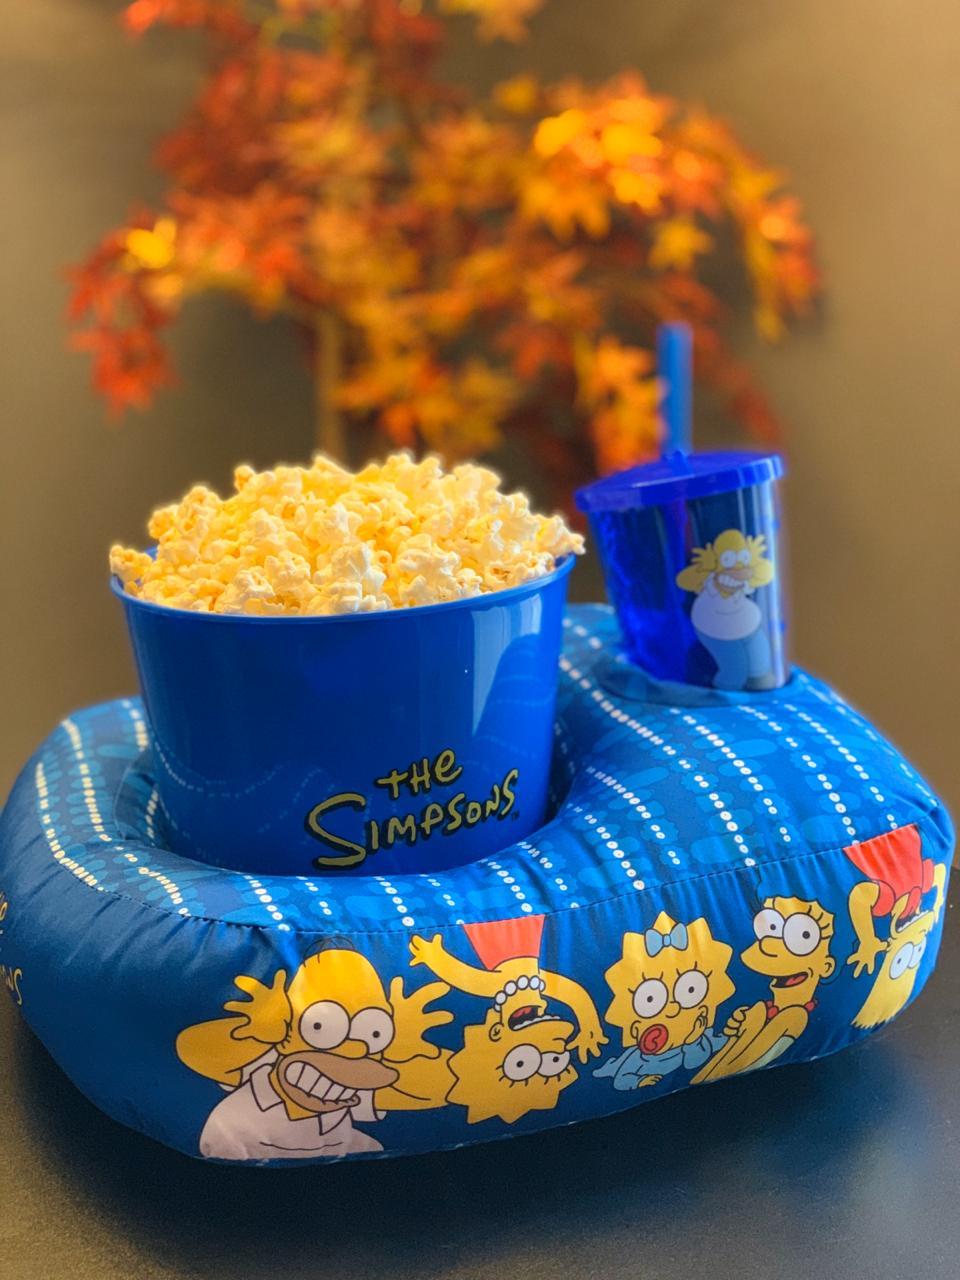 Kit Almofada Porta Pipoca (Individual) Os Simpsons (The Simpsons)